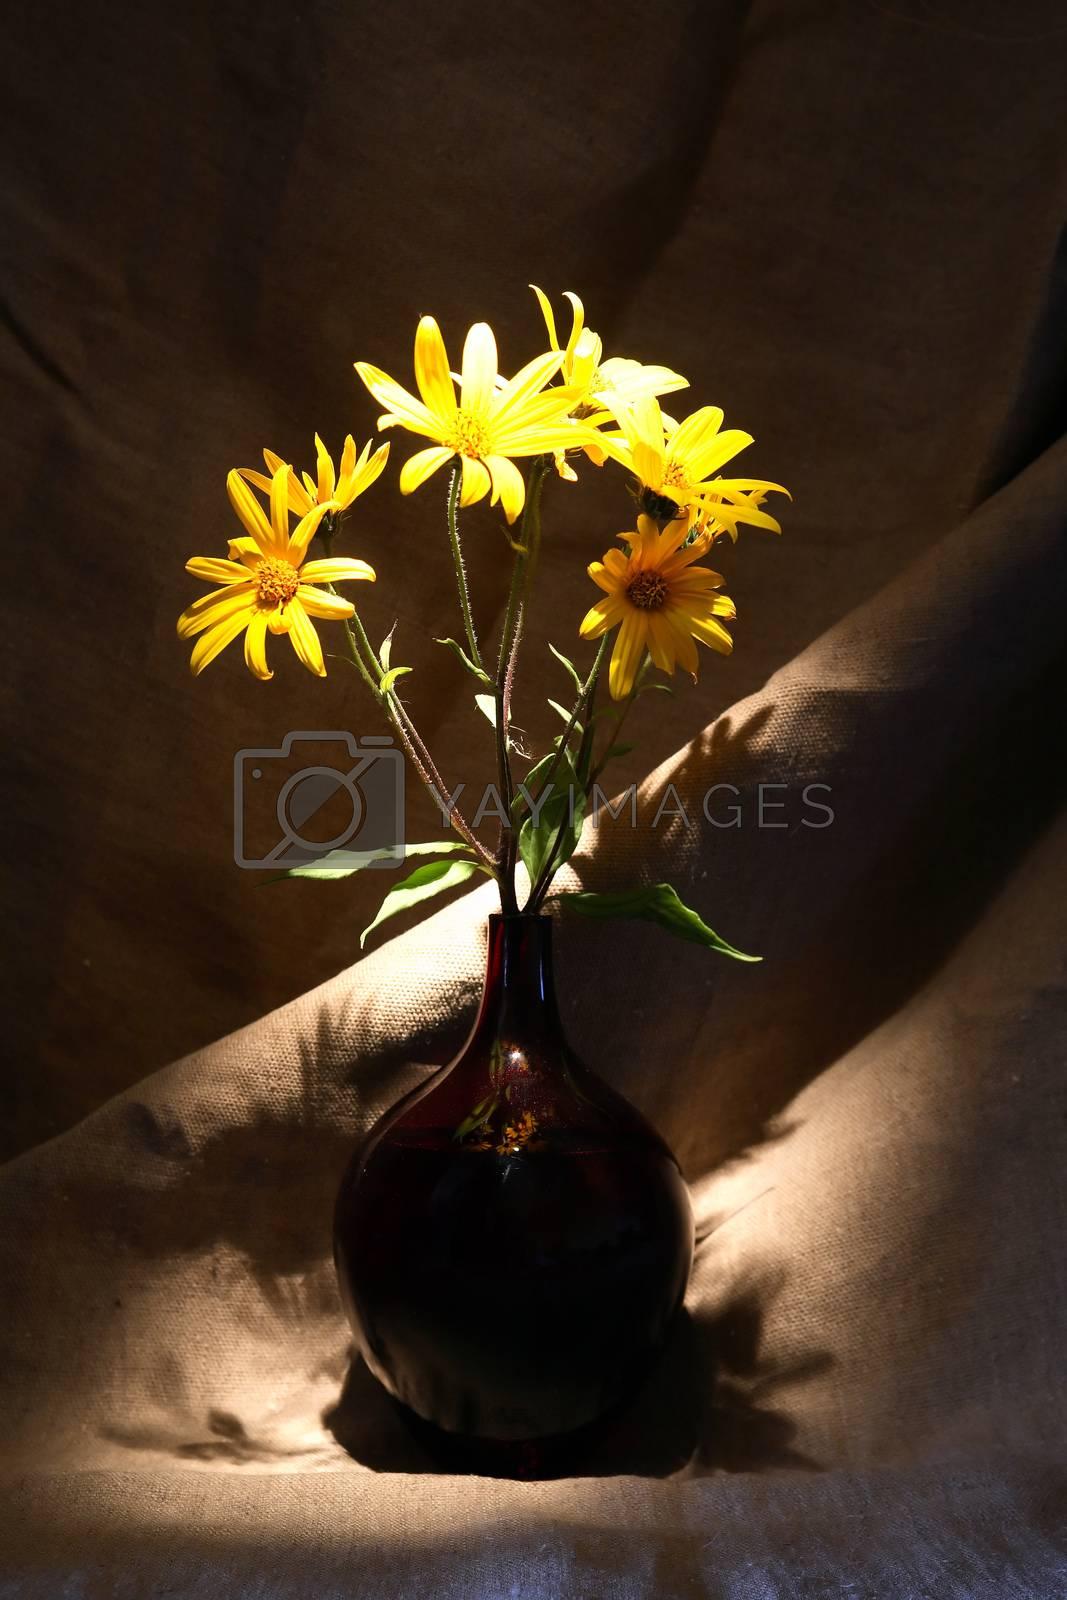 Royalty free image of Flowers In Vase by kvkirillov